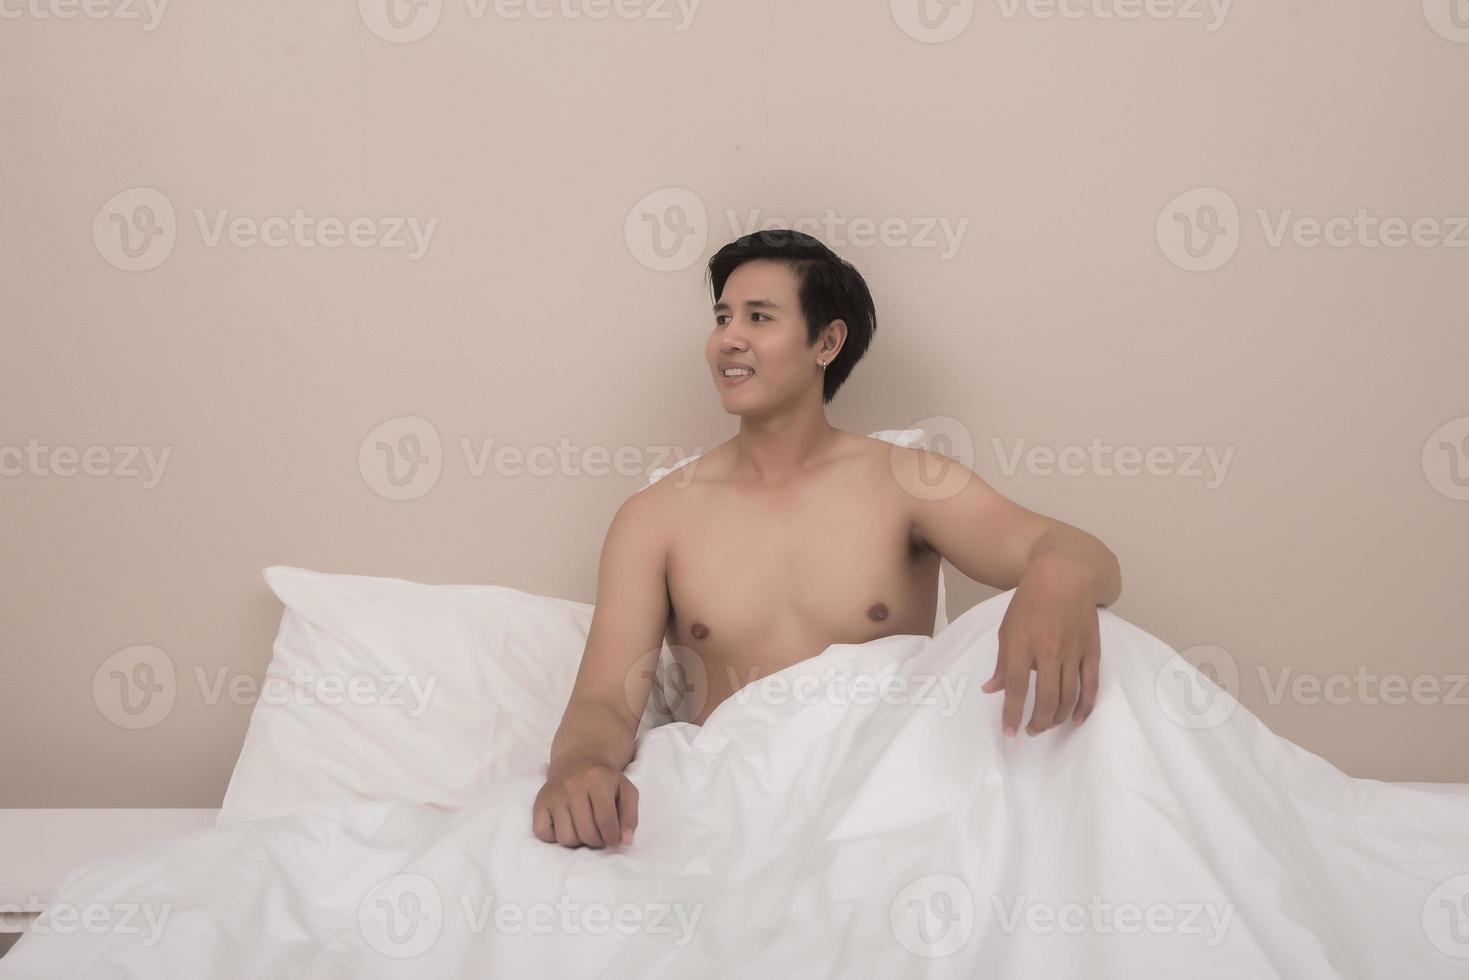 homem bonito acordando na cama foto